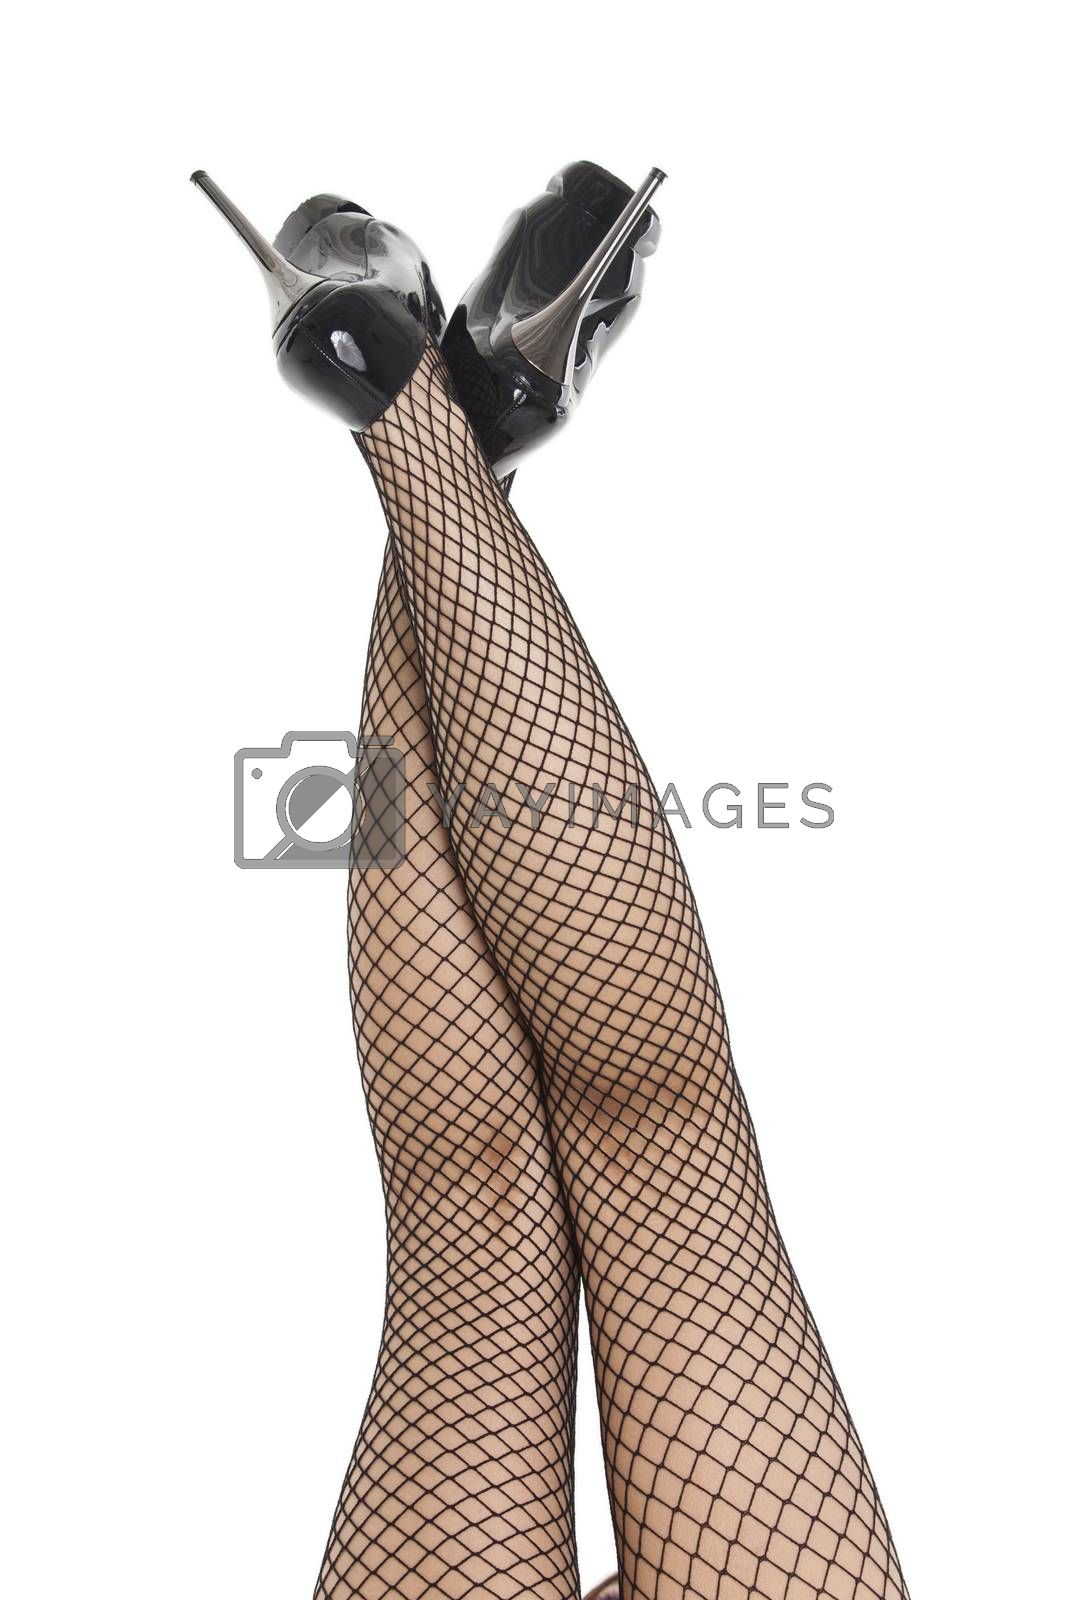 womans feet in fish net stockings